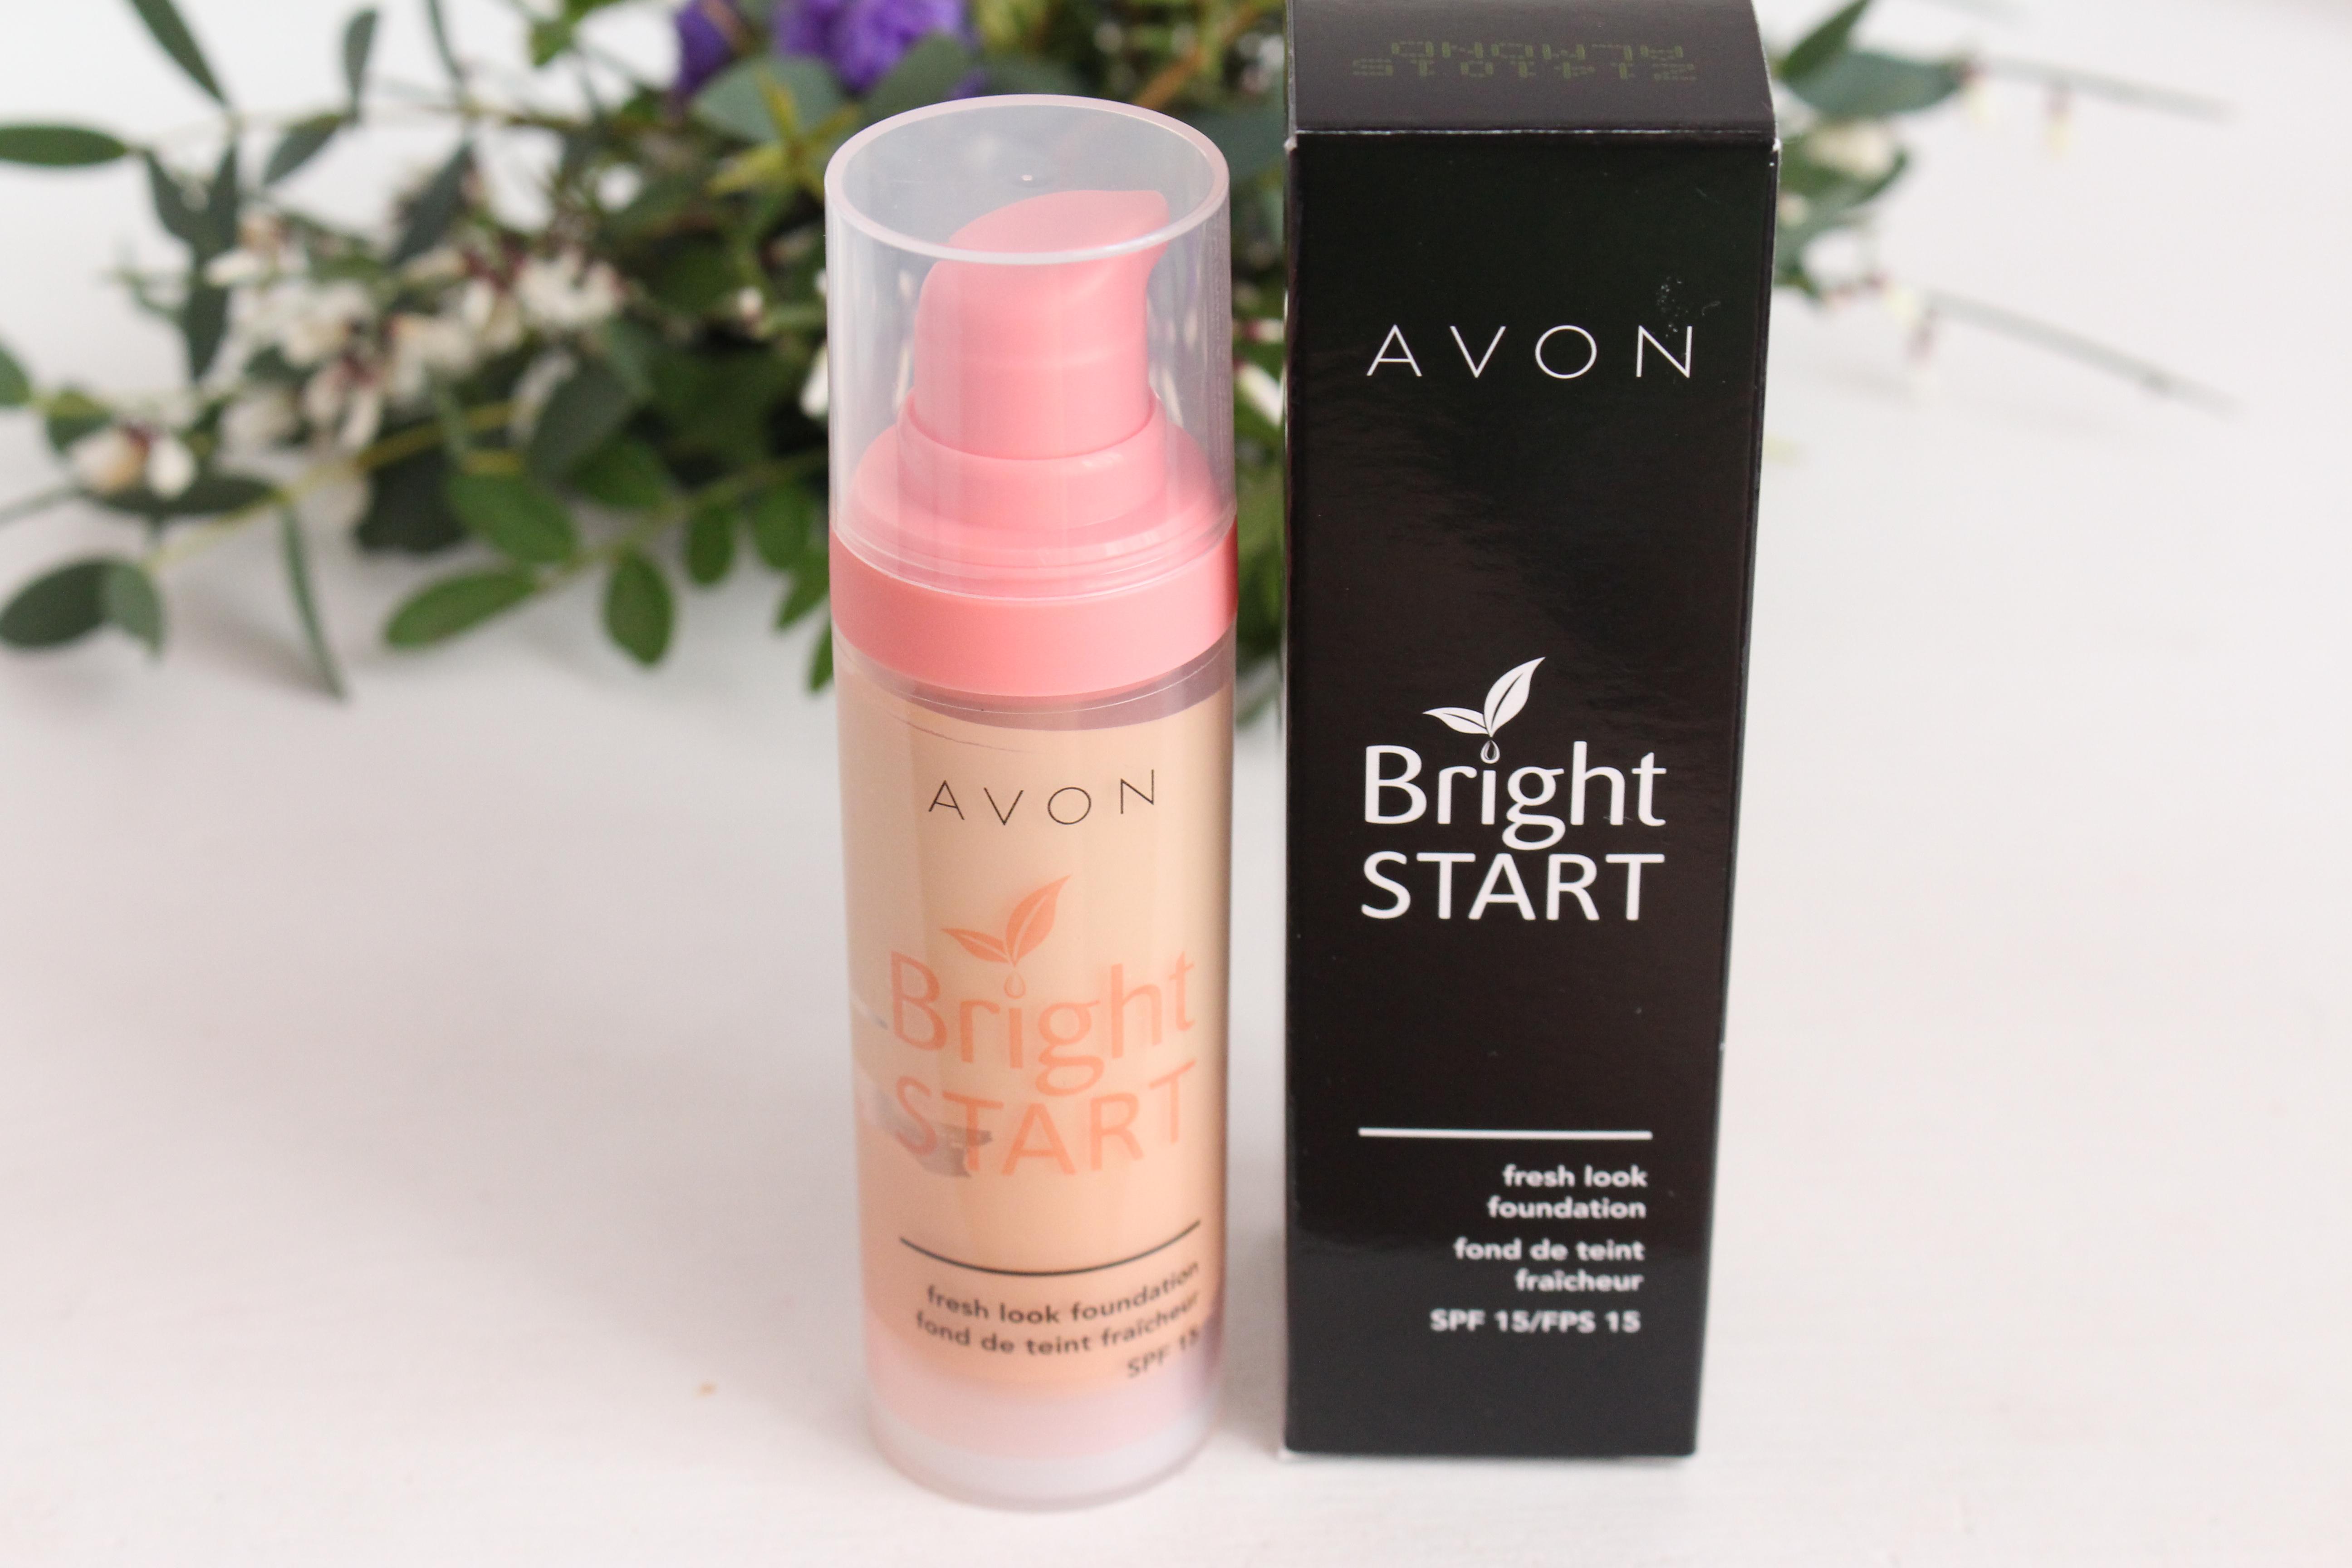 Avon Bright Start Fresh Look Foundation SPF 15 Тональное средство для лица «Заряд свежести»